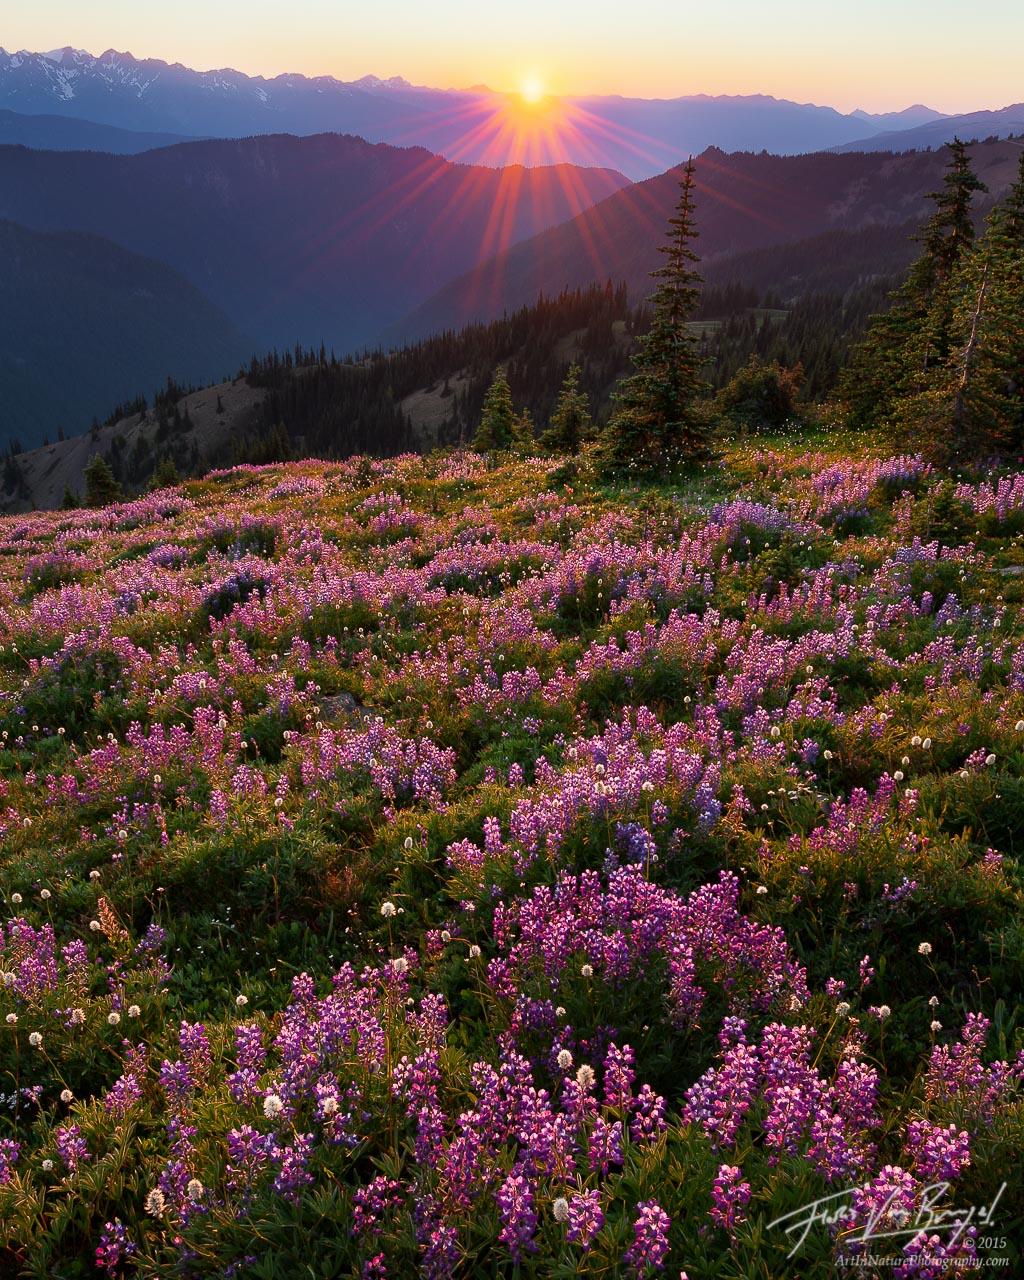 Alpine Flowers, Hurricane Ridge, Olympic National Park, sunset, photo